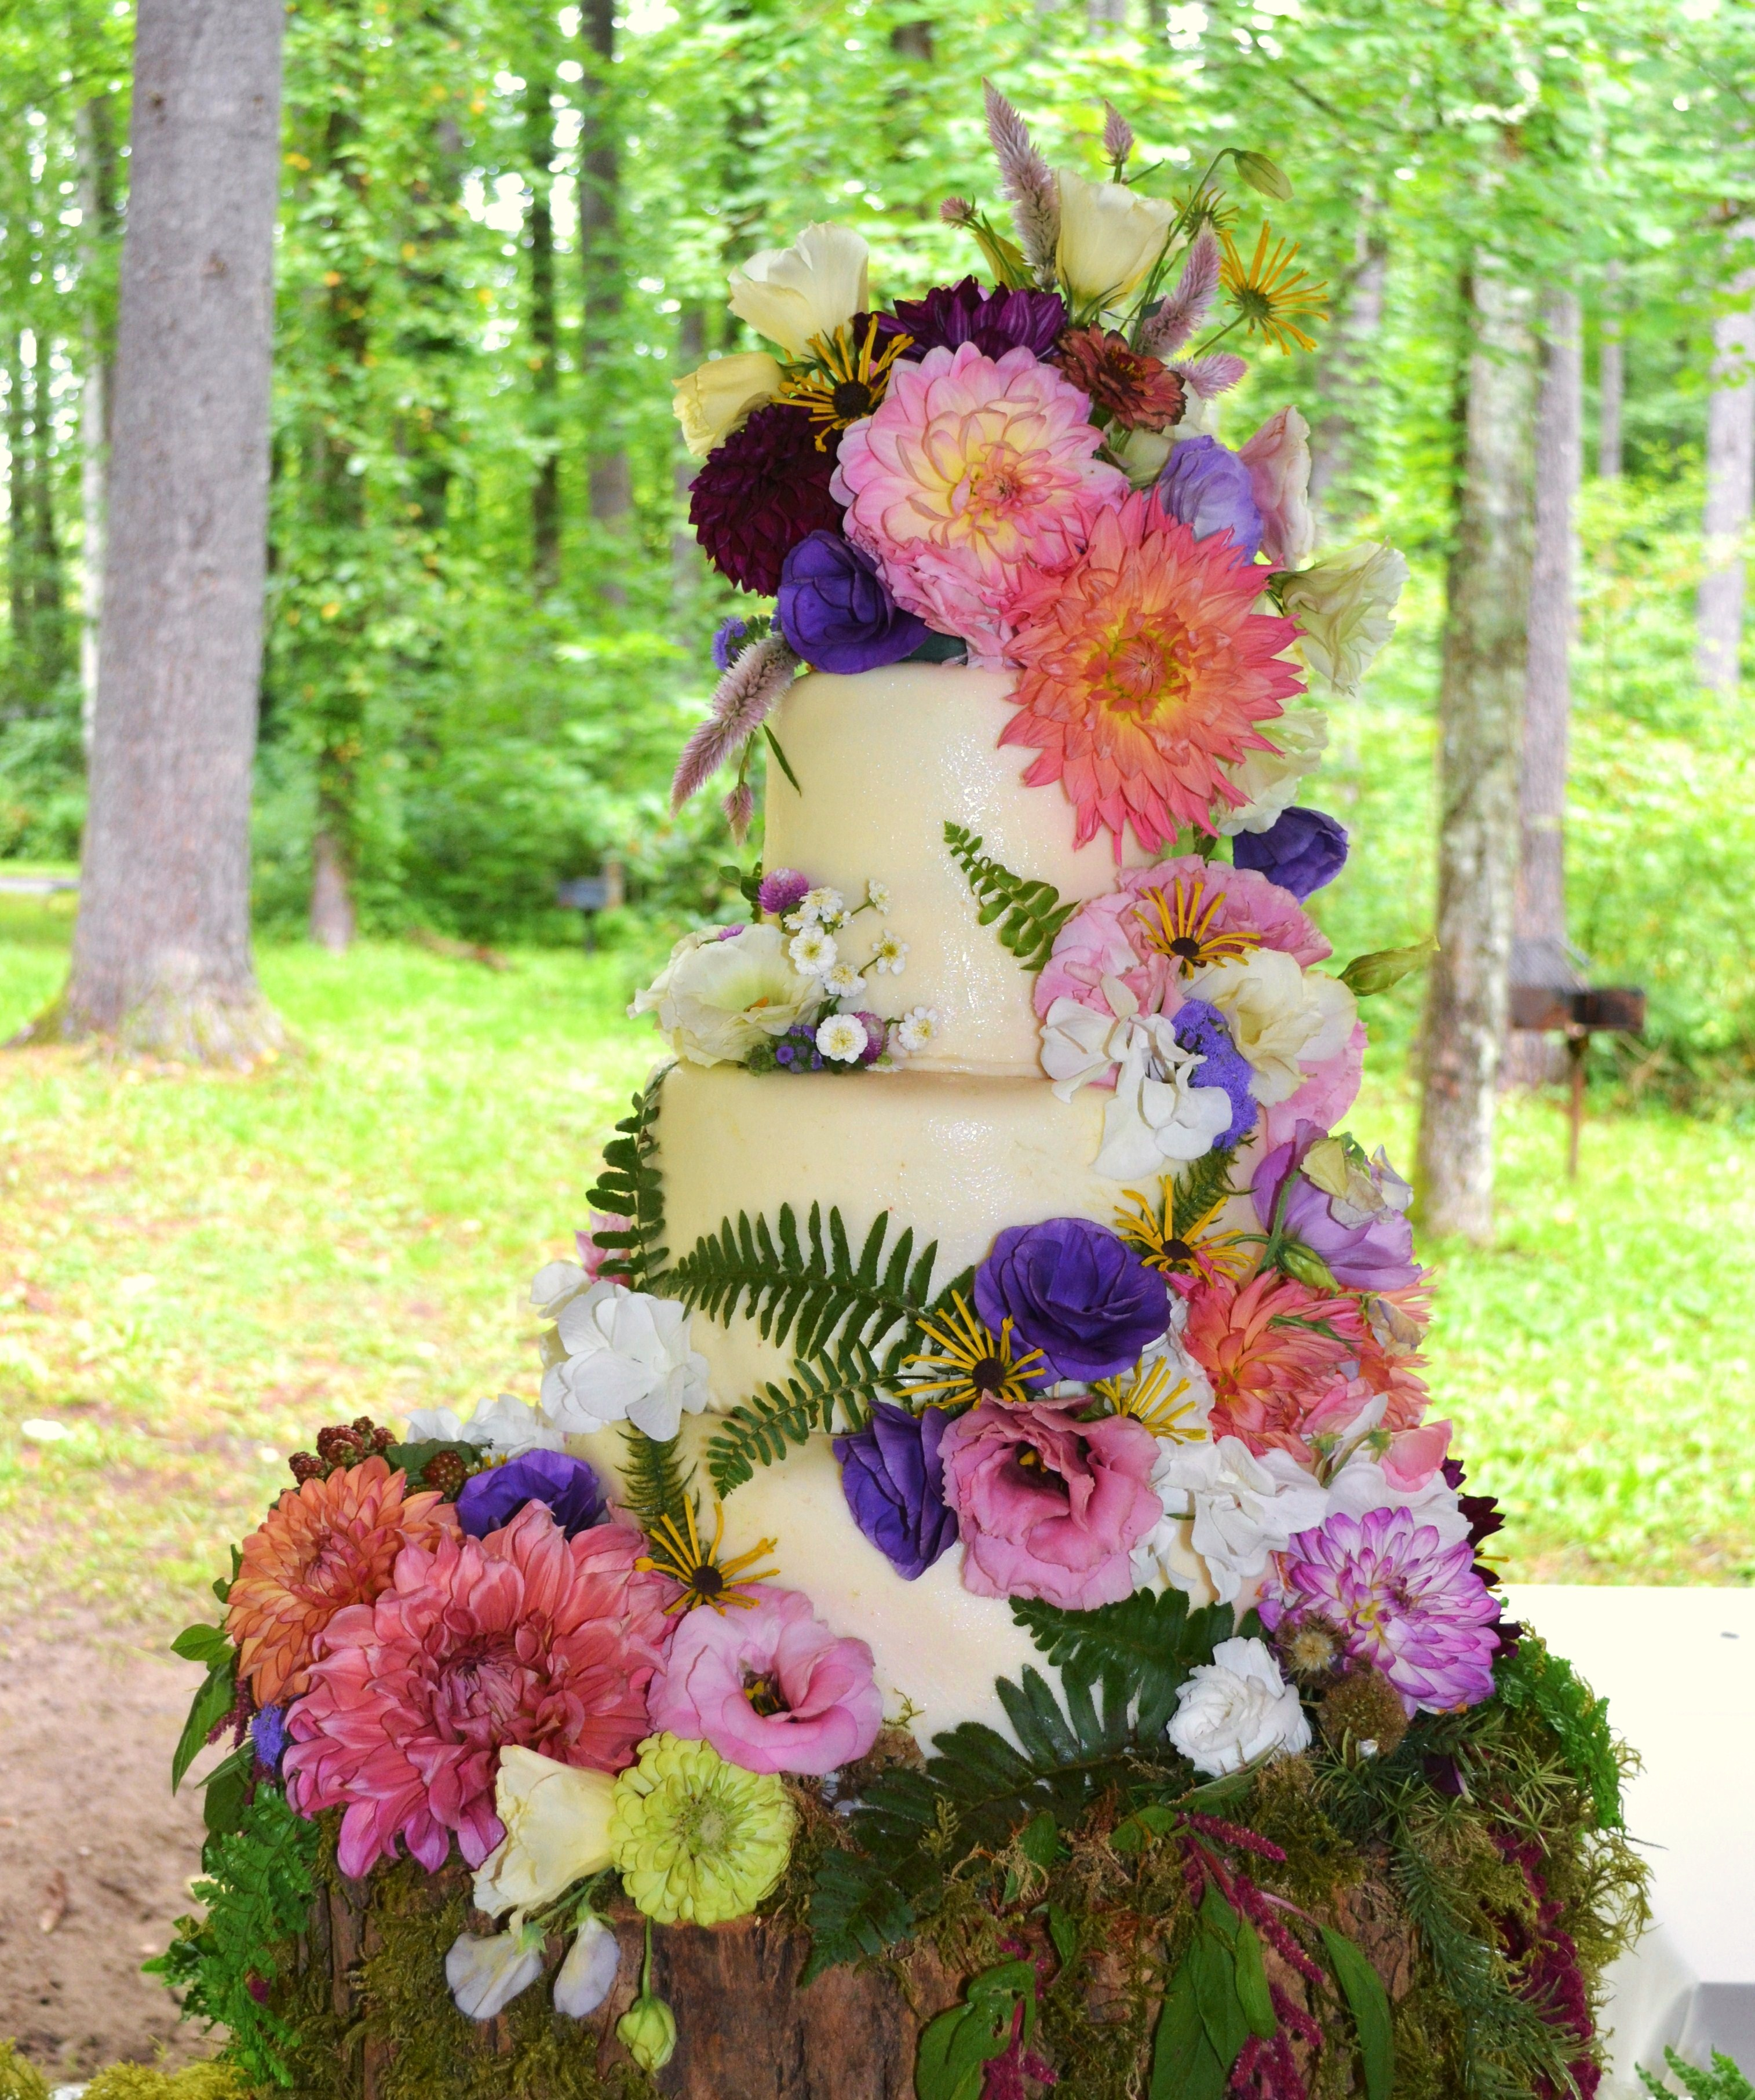 Wedding Cake 1 A